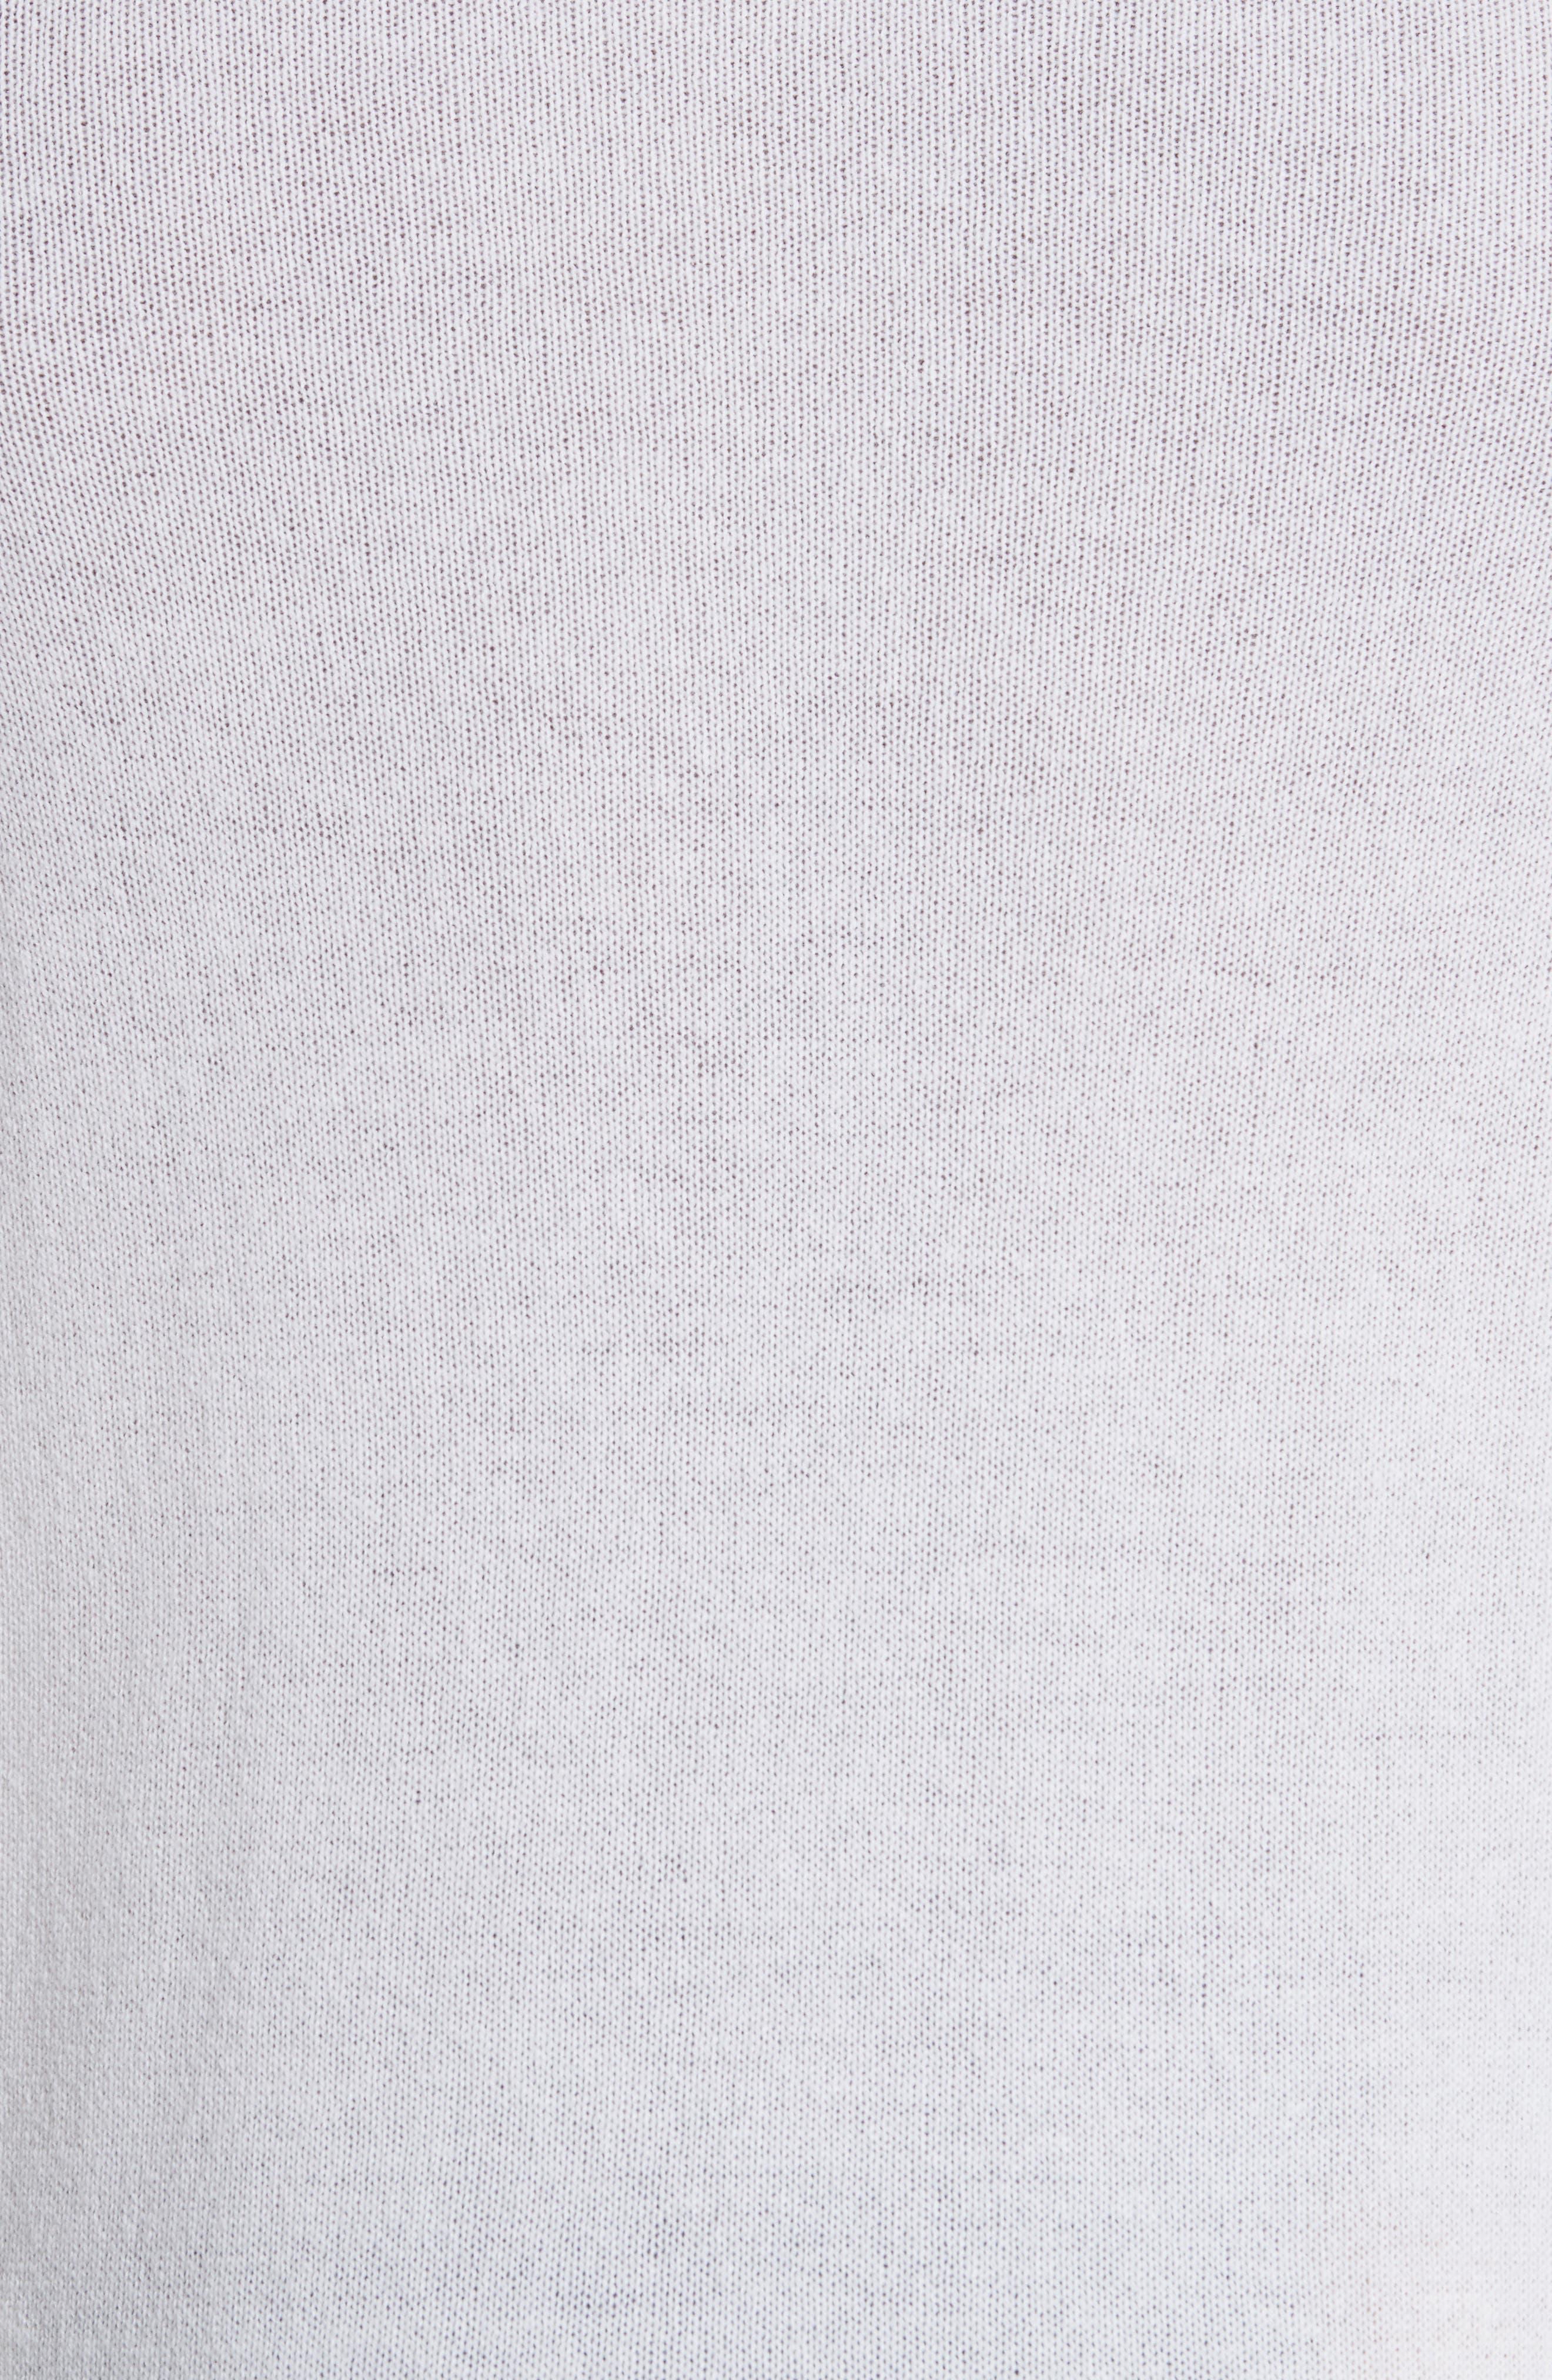 Cashmere Crewneck Sweater,                             Alternate thumbnail 5, color,                             White